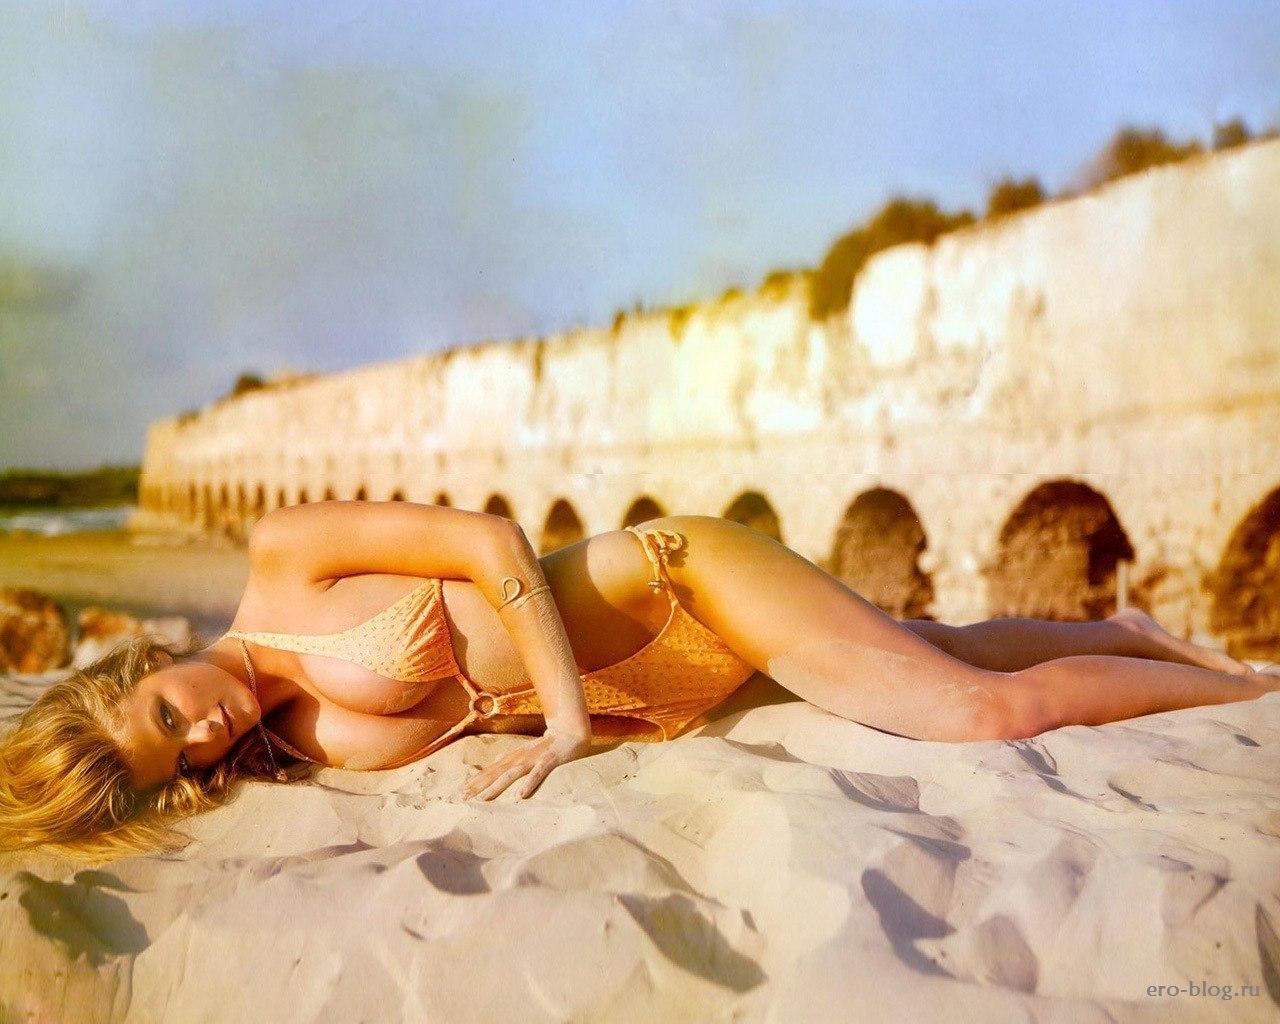 Голая обнаженная Brooklyn Decker   Бруклин Деккер интимные фото звезды